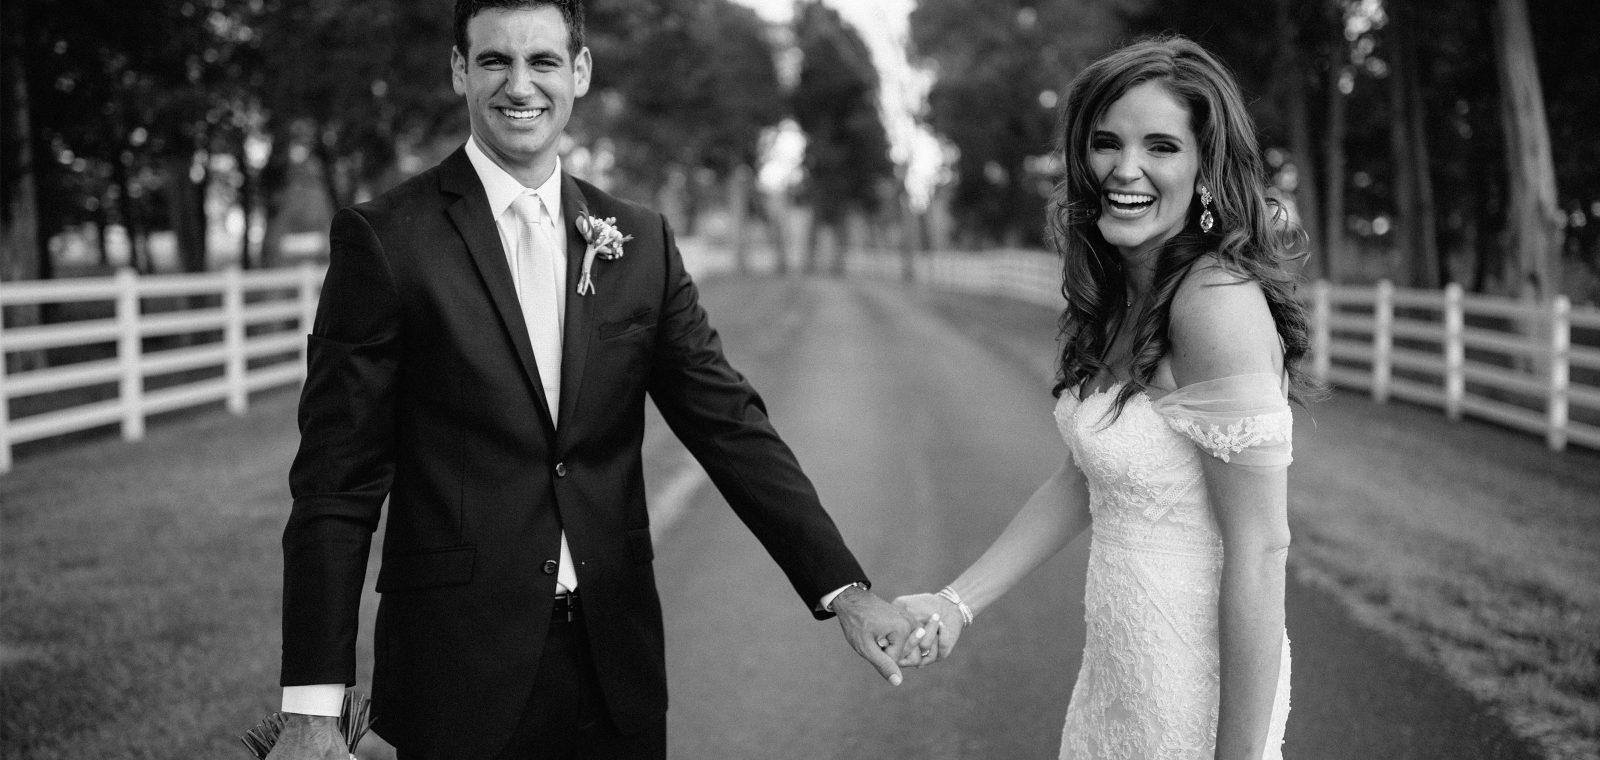 Marblegate Farms Wedding – Knoxville, TN – Kyle & Kristen